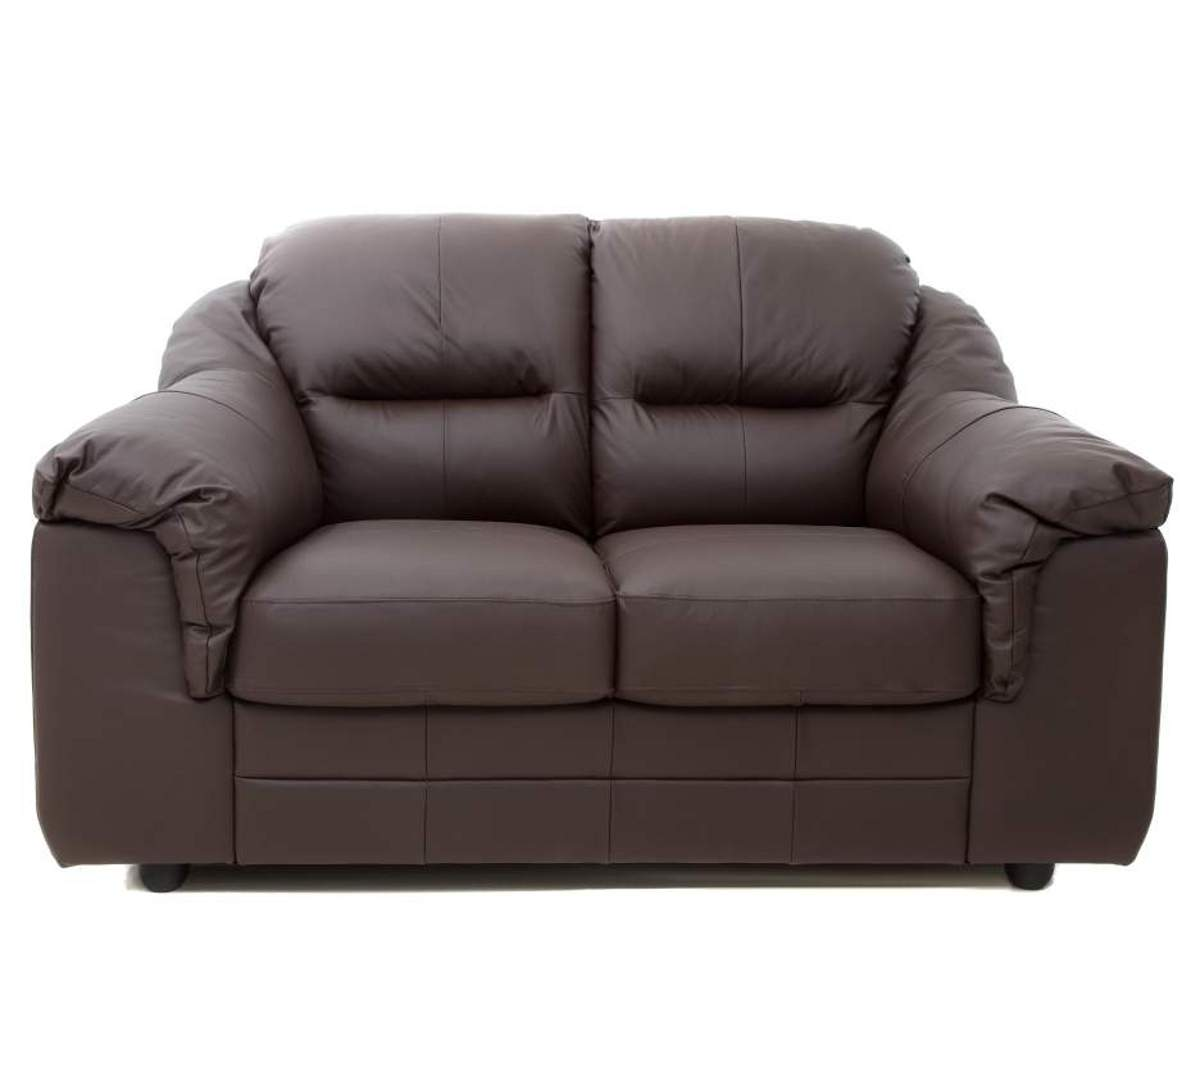 brown sofas cheap grey fabric chesterfield corner sofa modern home furniture feel the